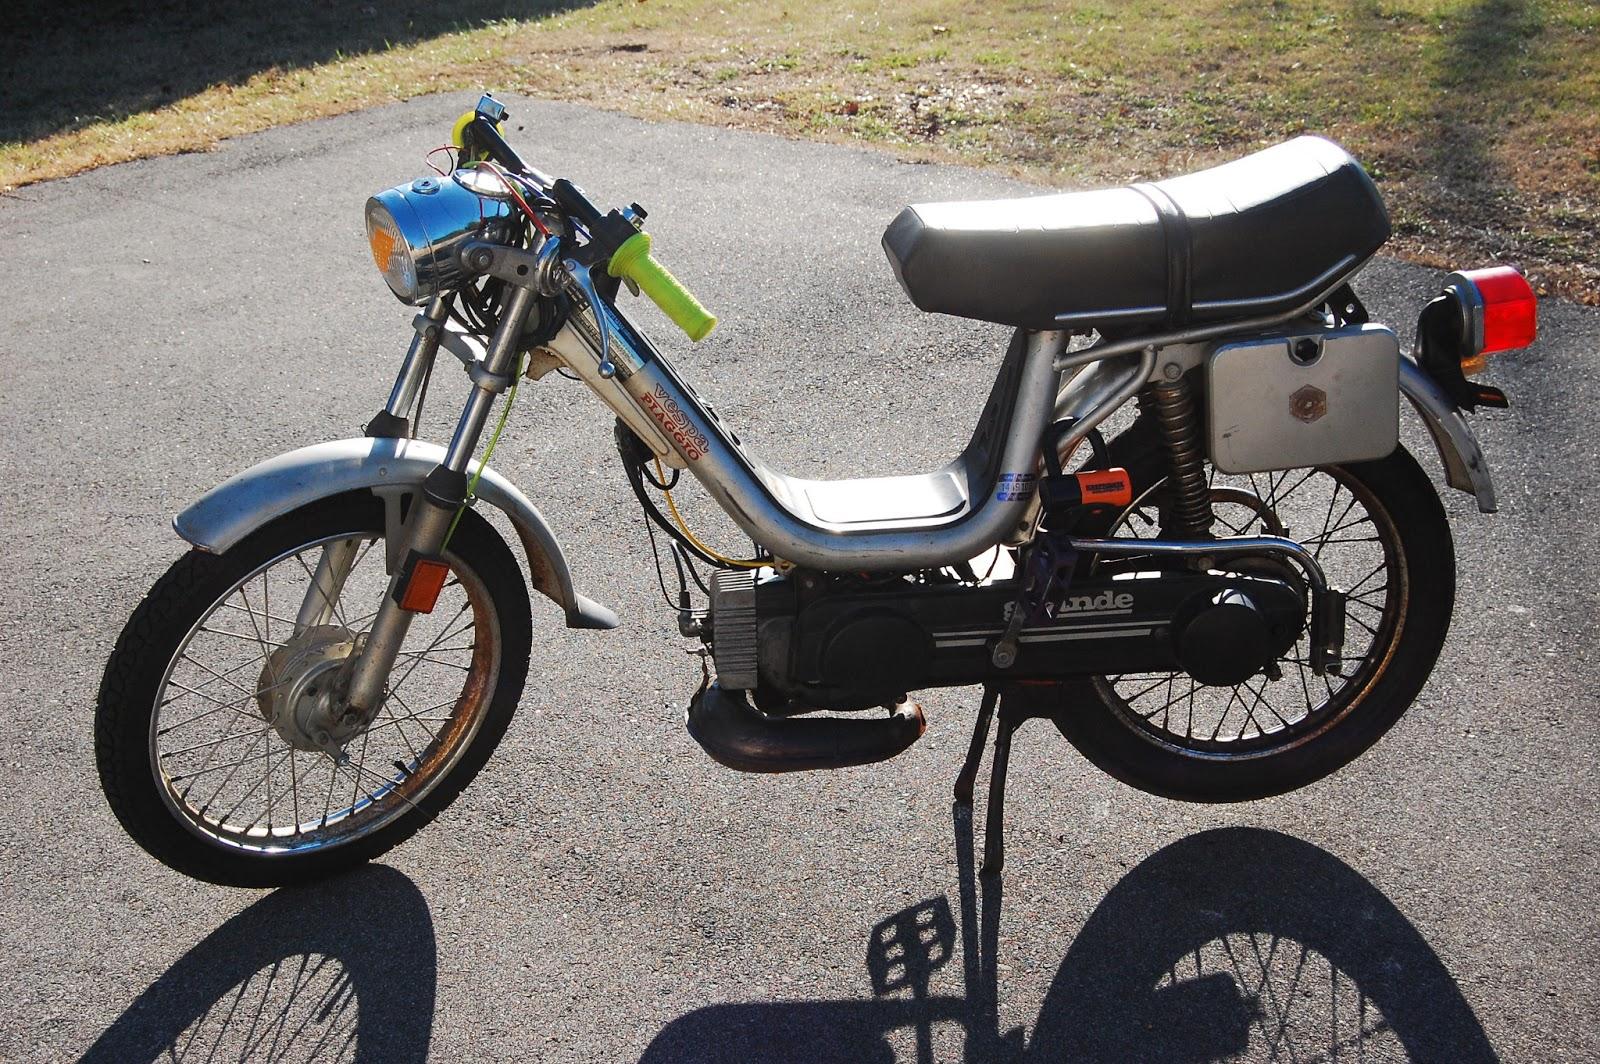 Vespa Grande Moped Manual